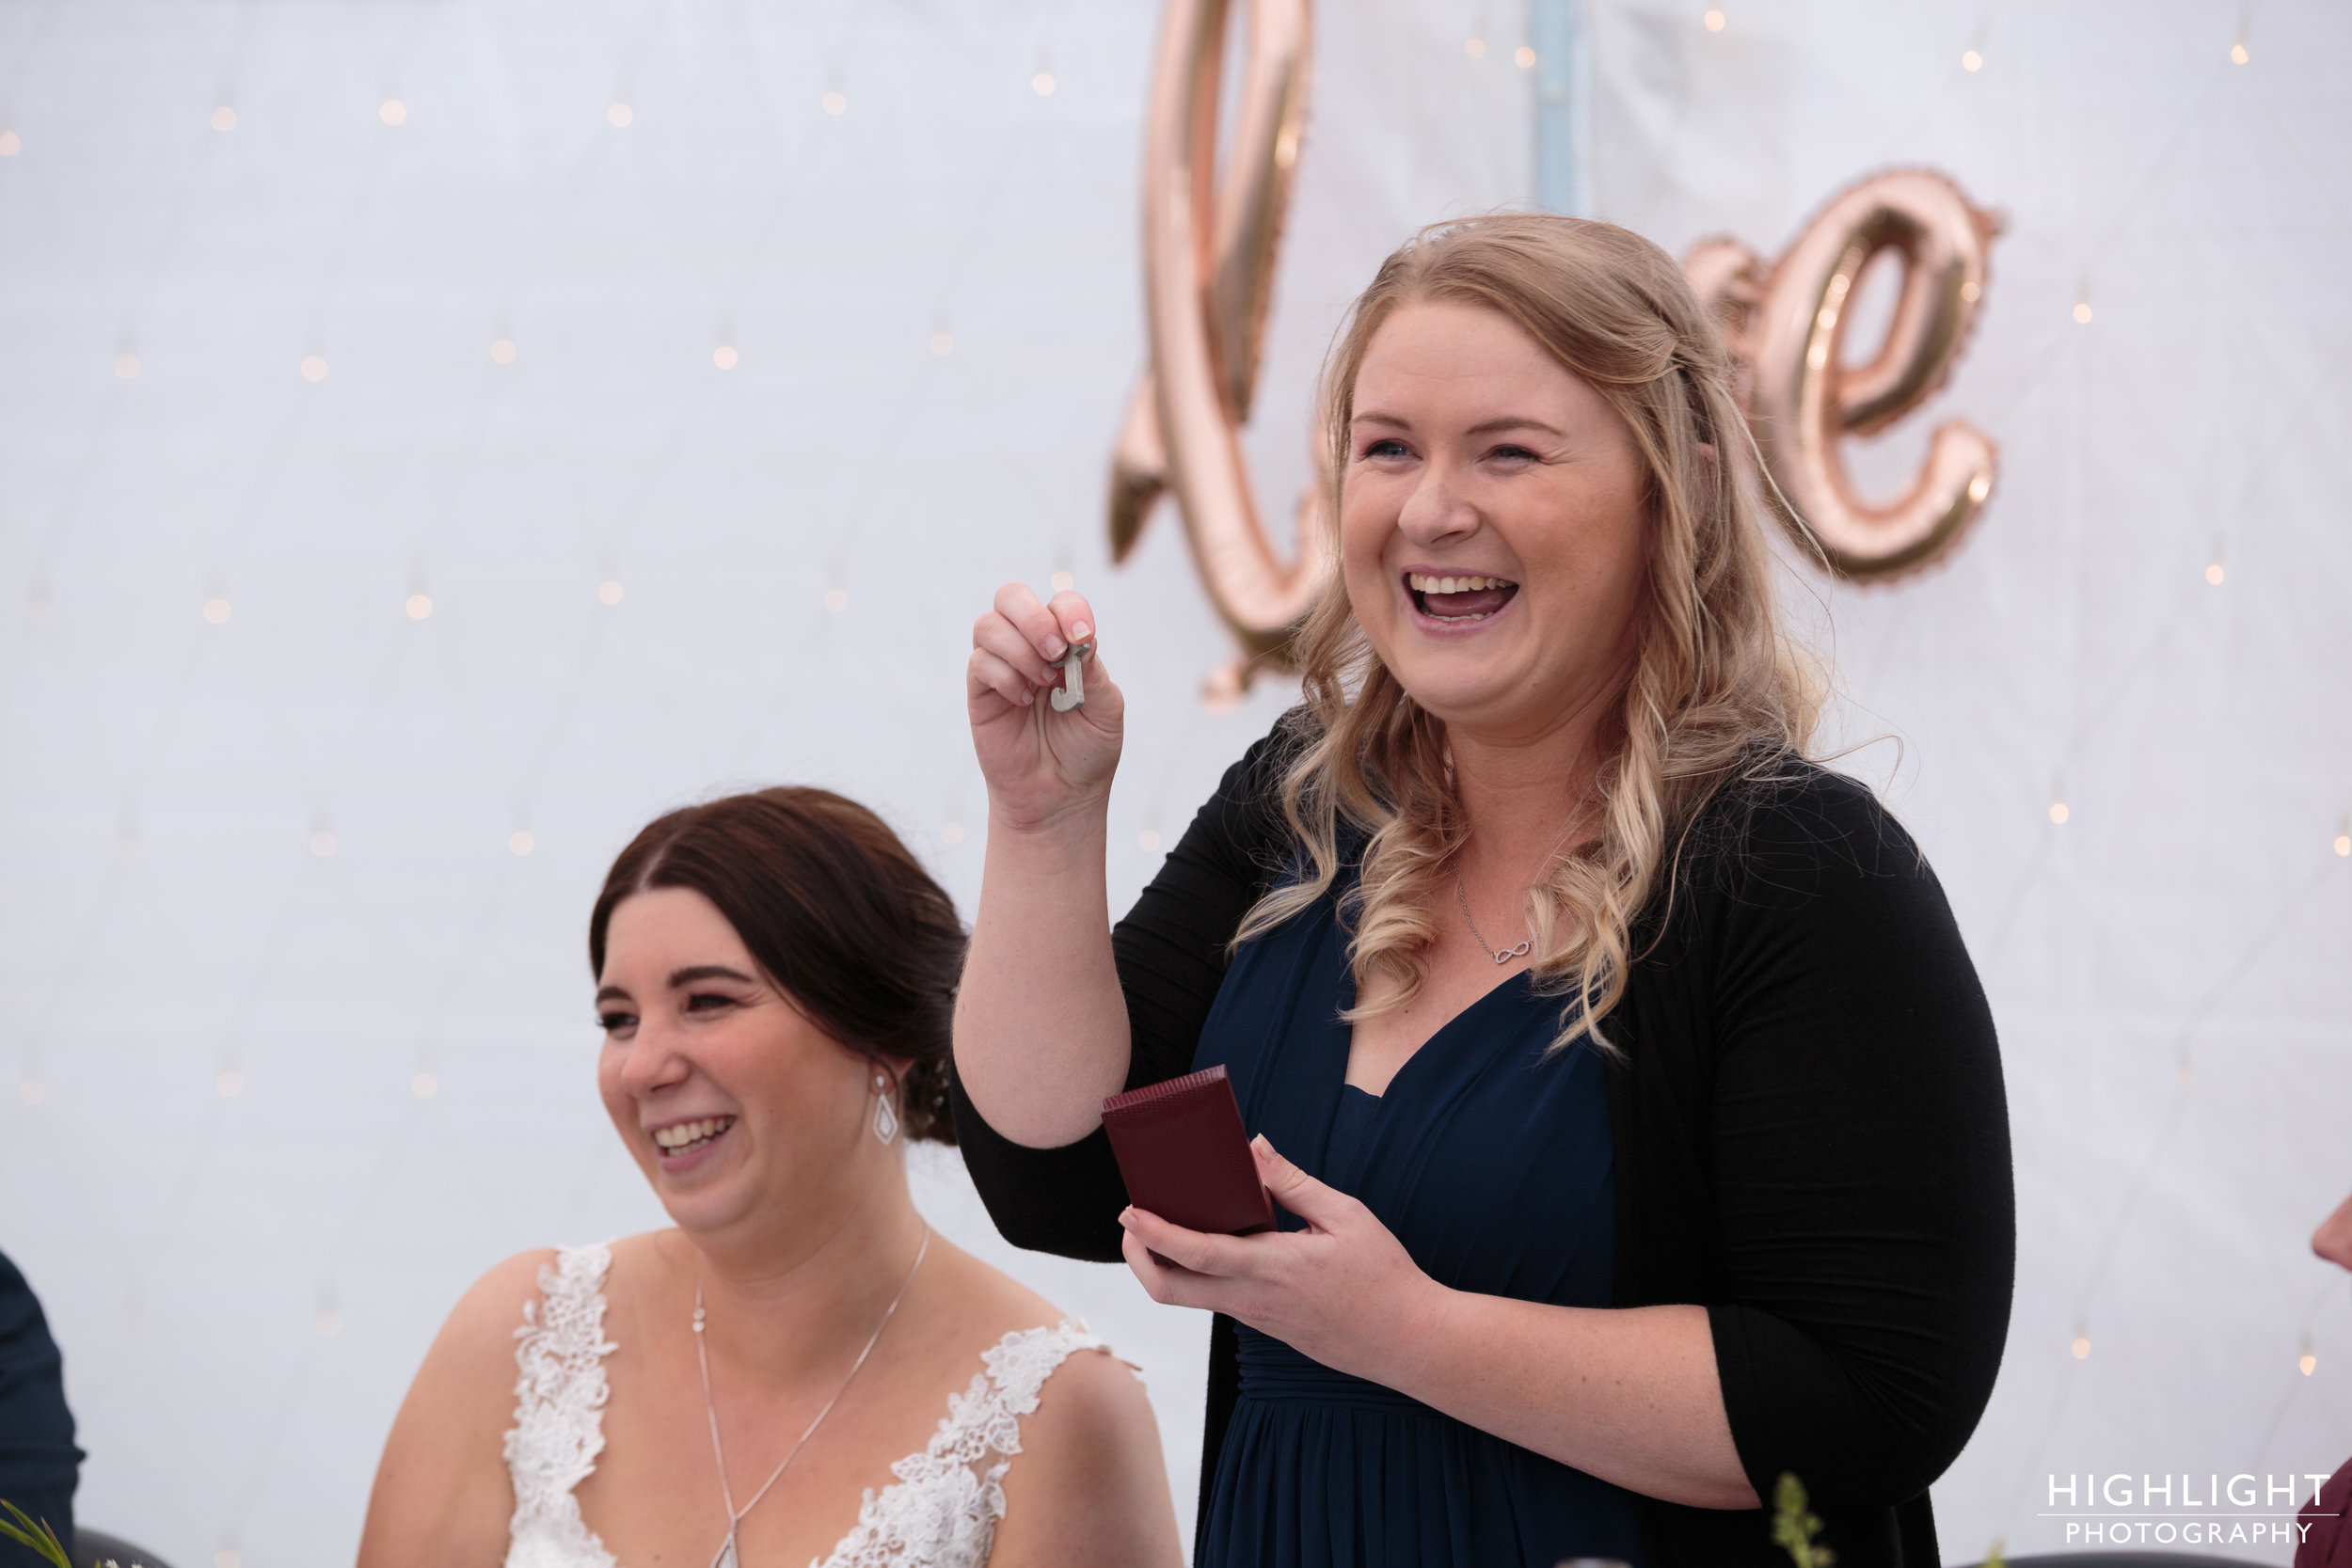 JM-2017-Highlight-wedding-photography-palmerston-north-new-zealand-191.jpg